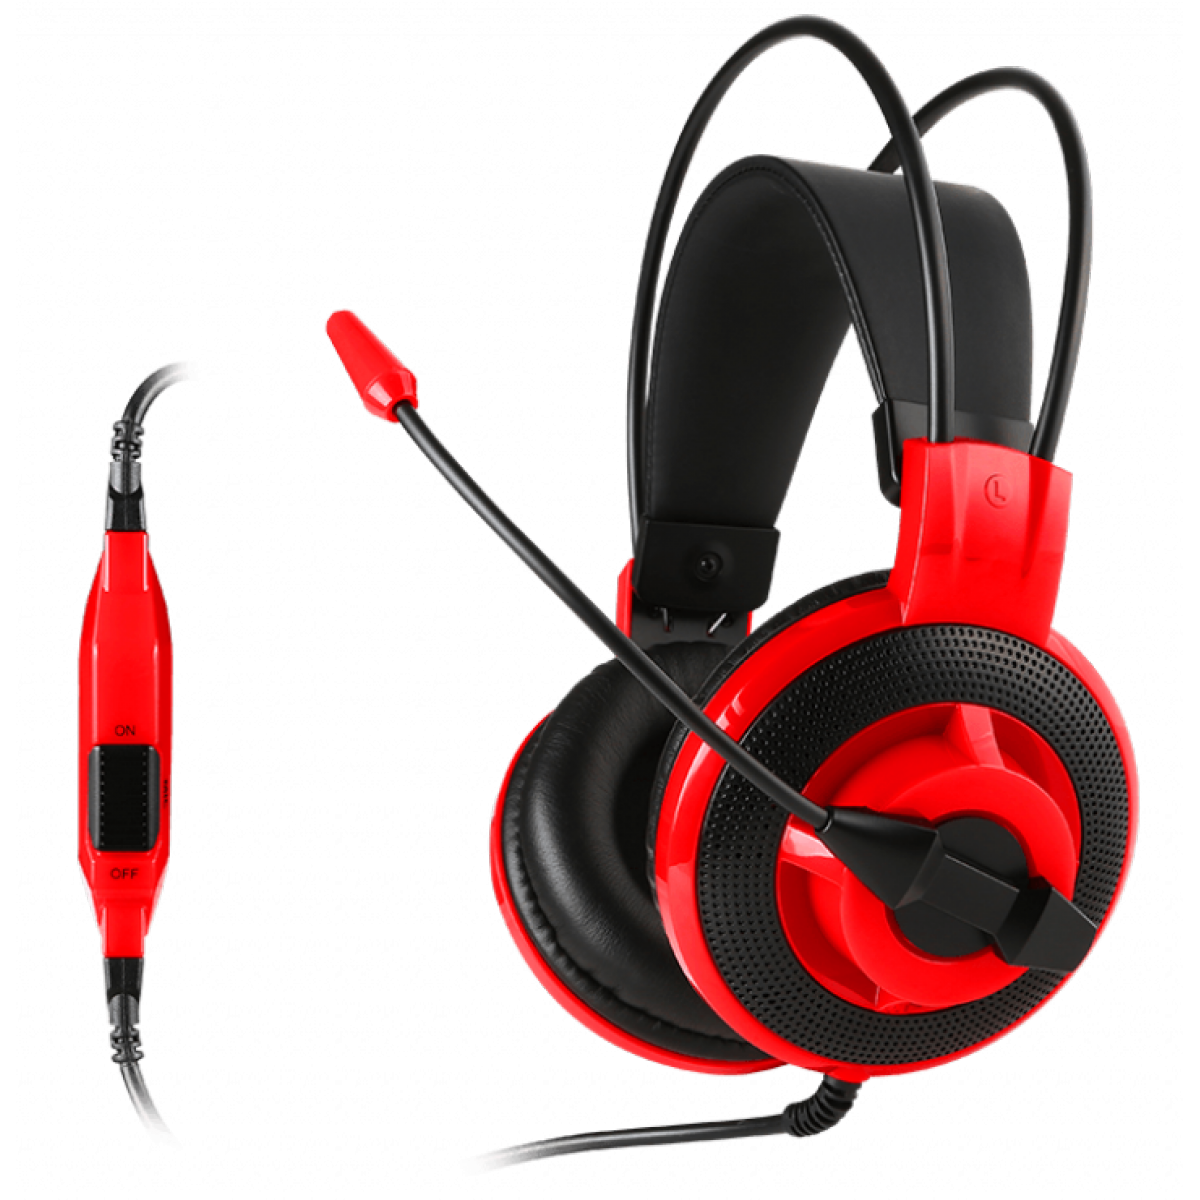 Headset Gamer MSI DS501, 3.5mm, Black/Red